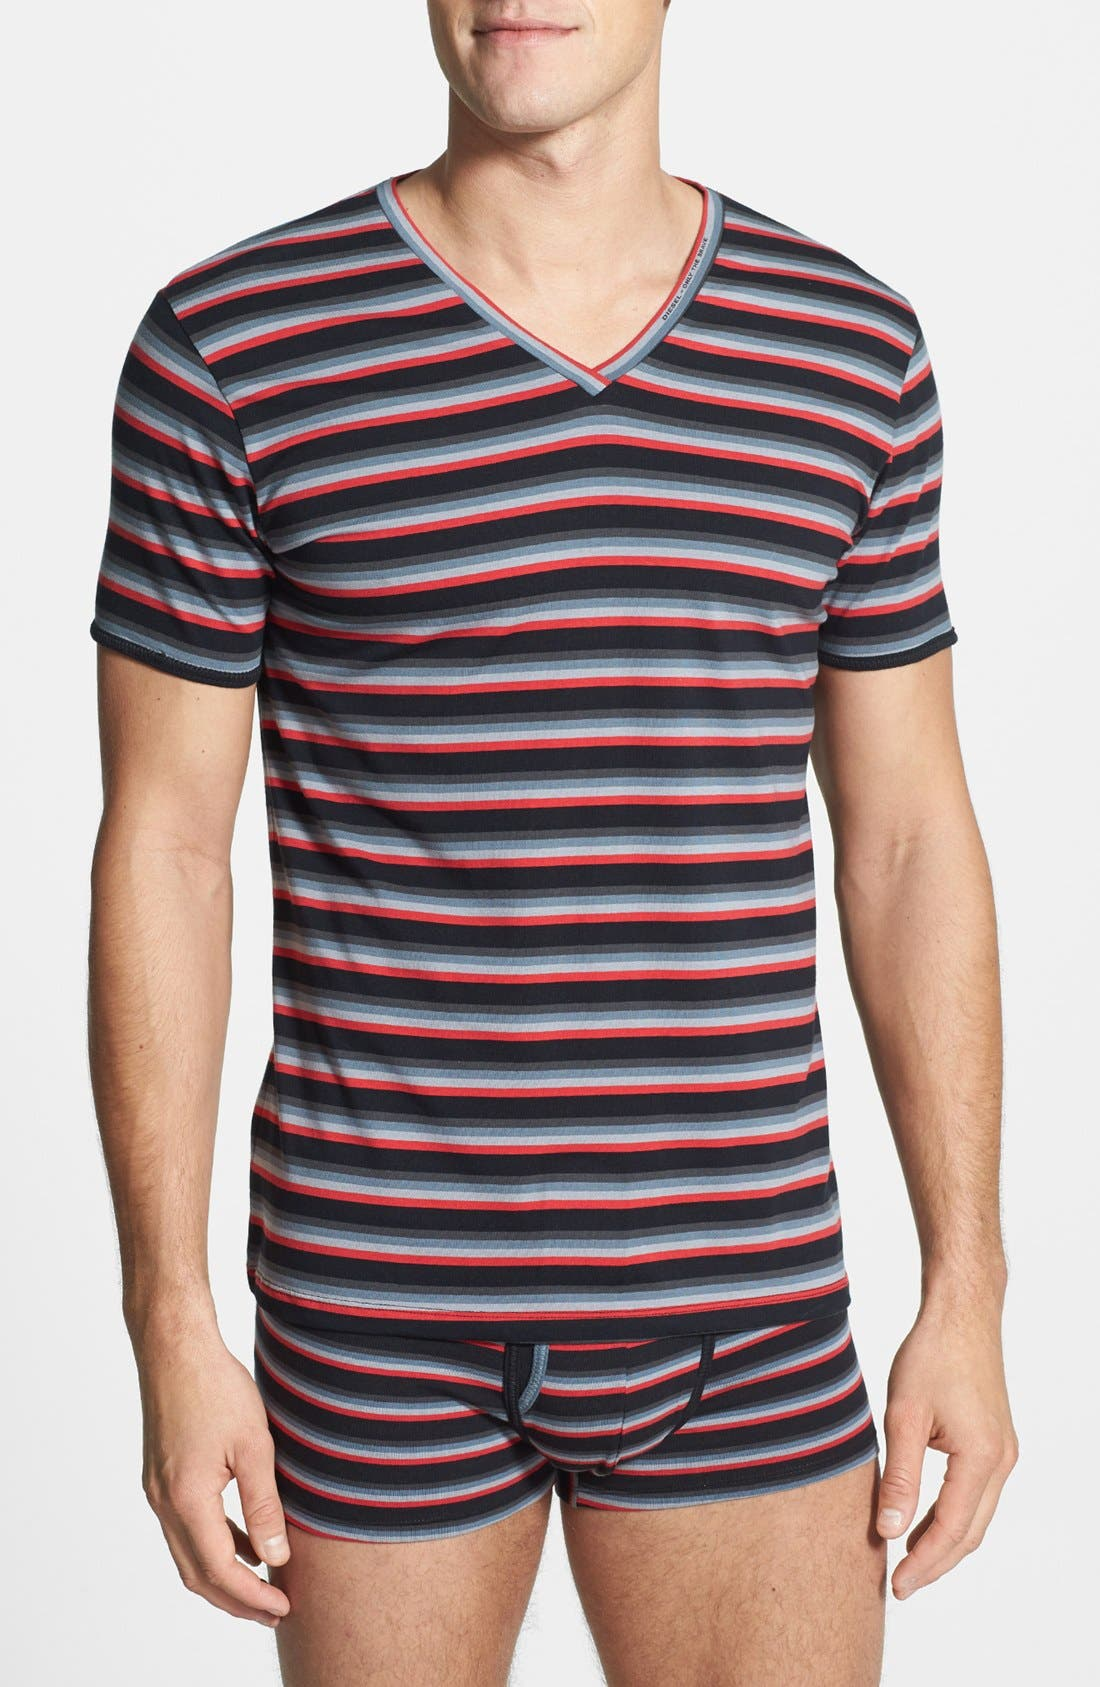 Main Image - DIESEL® 'Michael' Striped V-Neck Undershirt